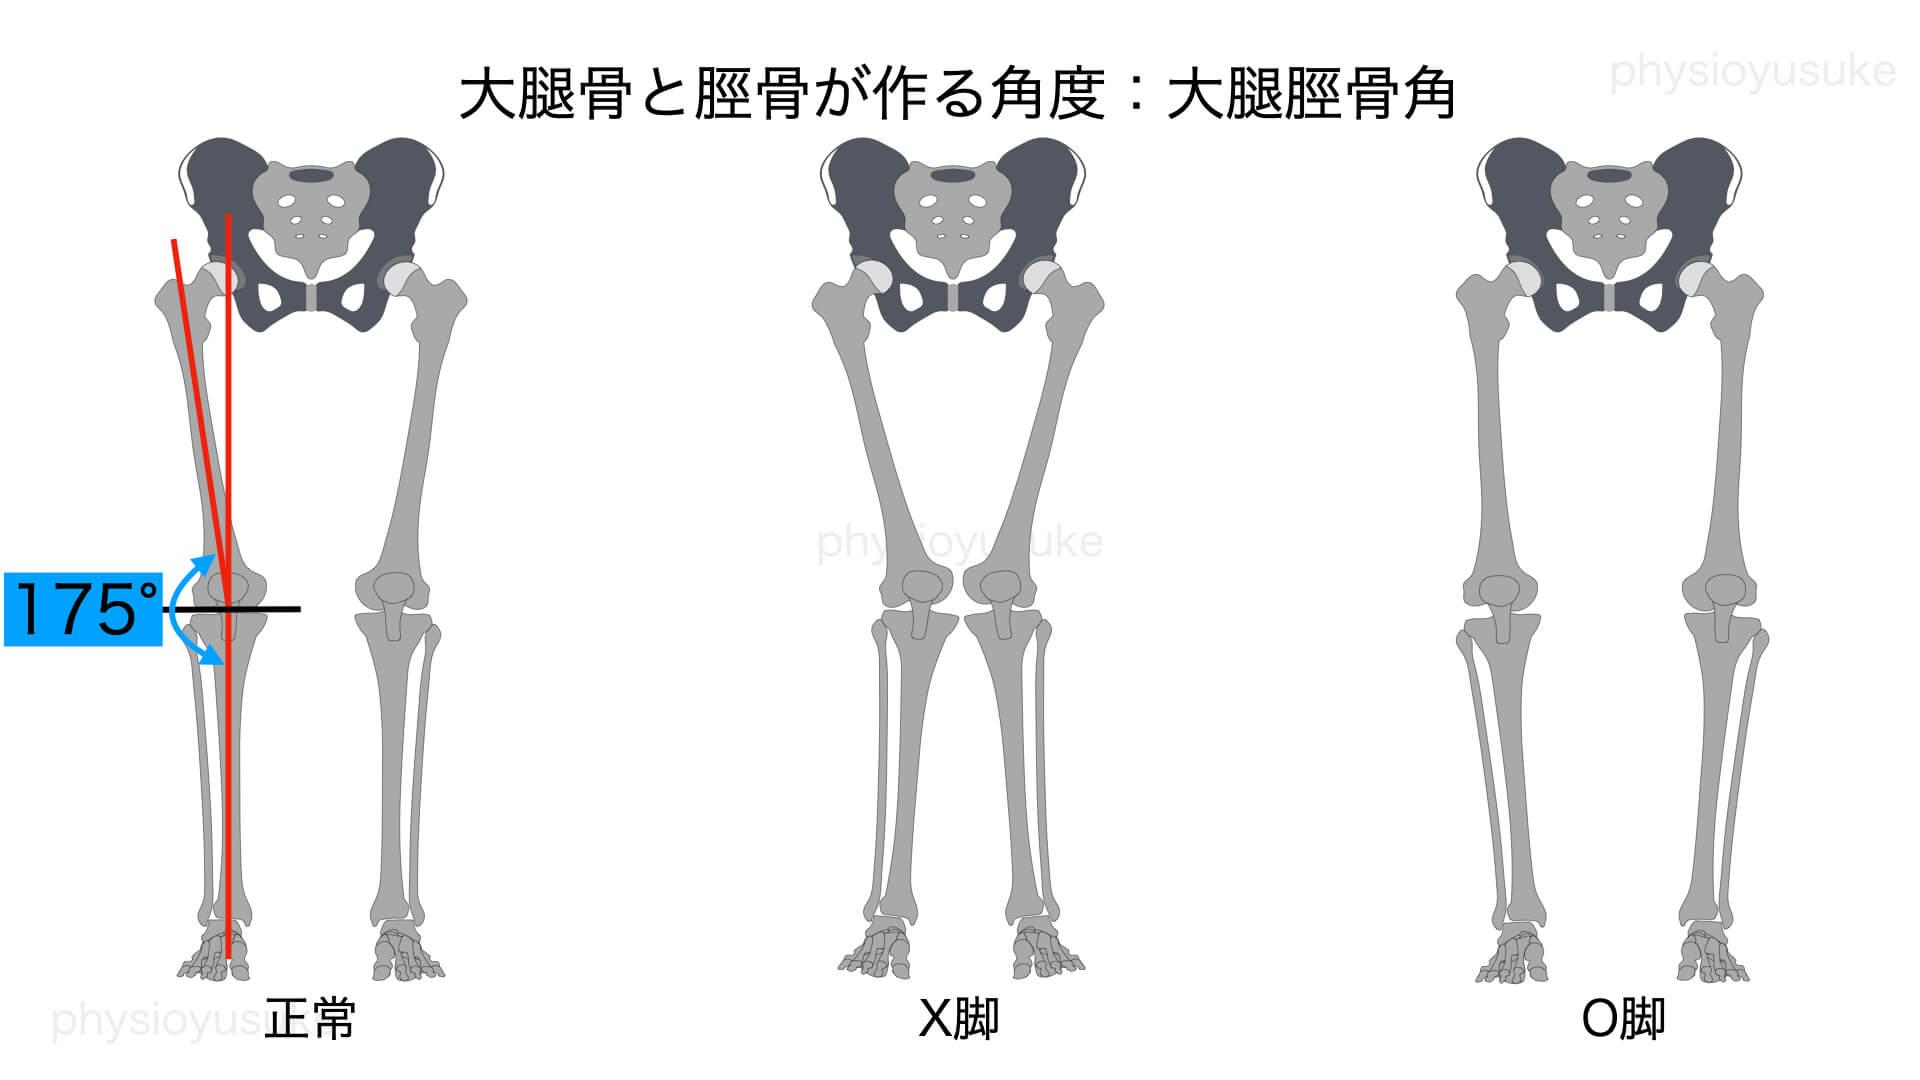 O脚種類、X脚